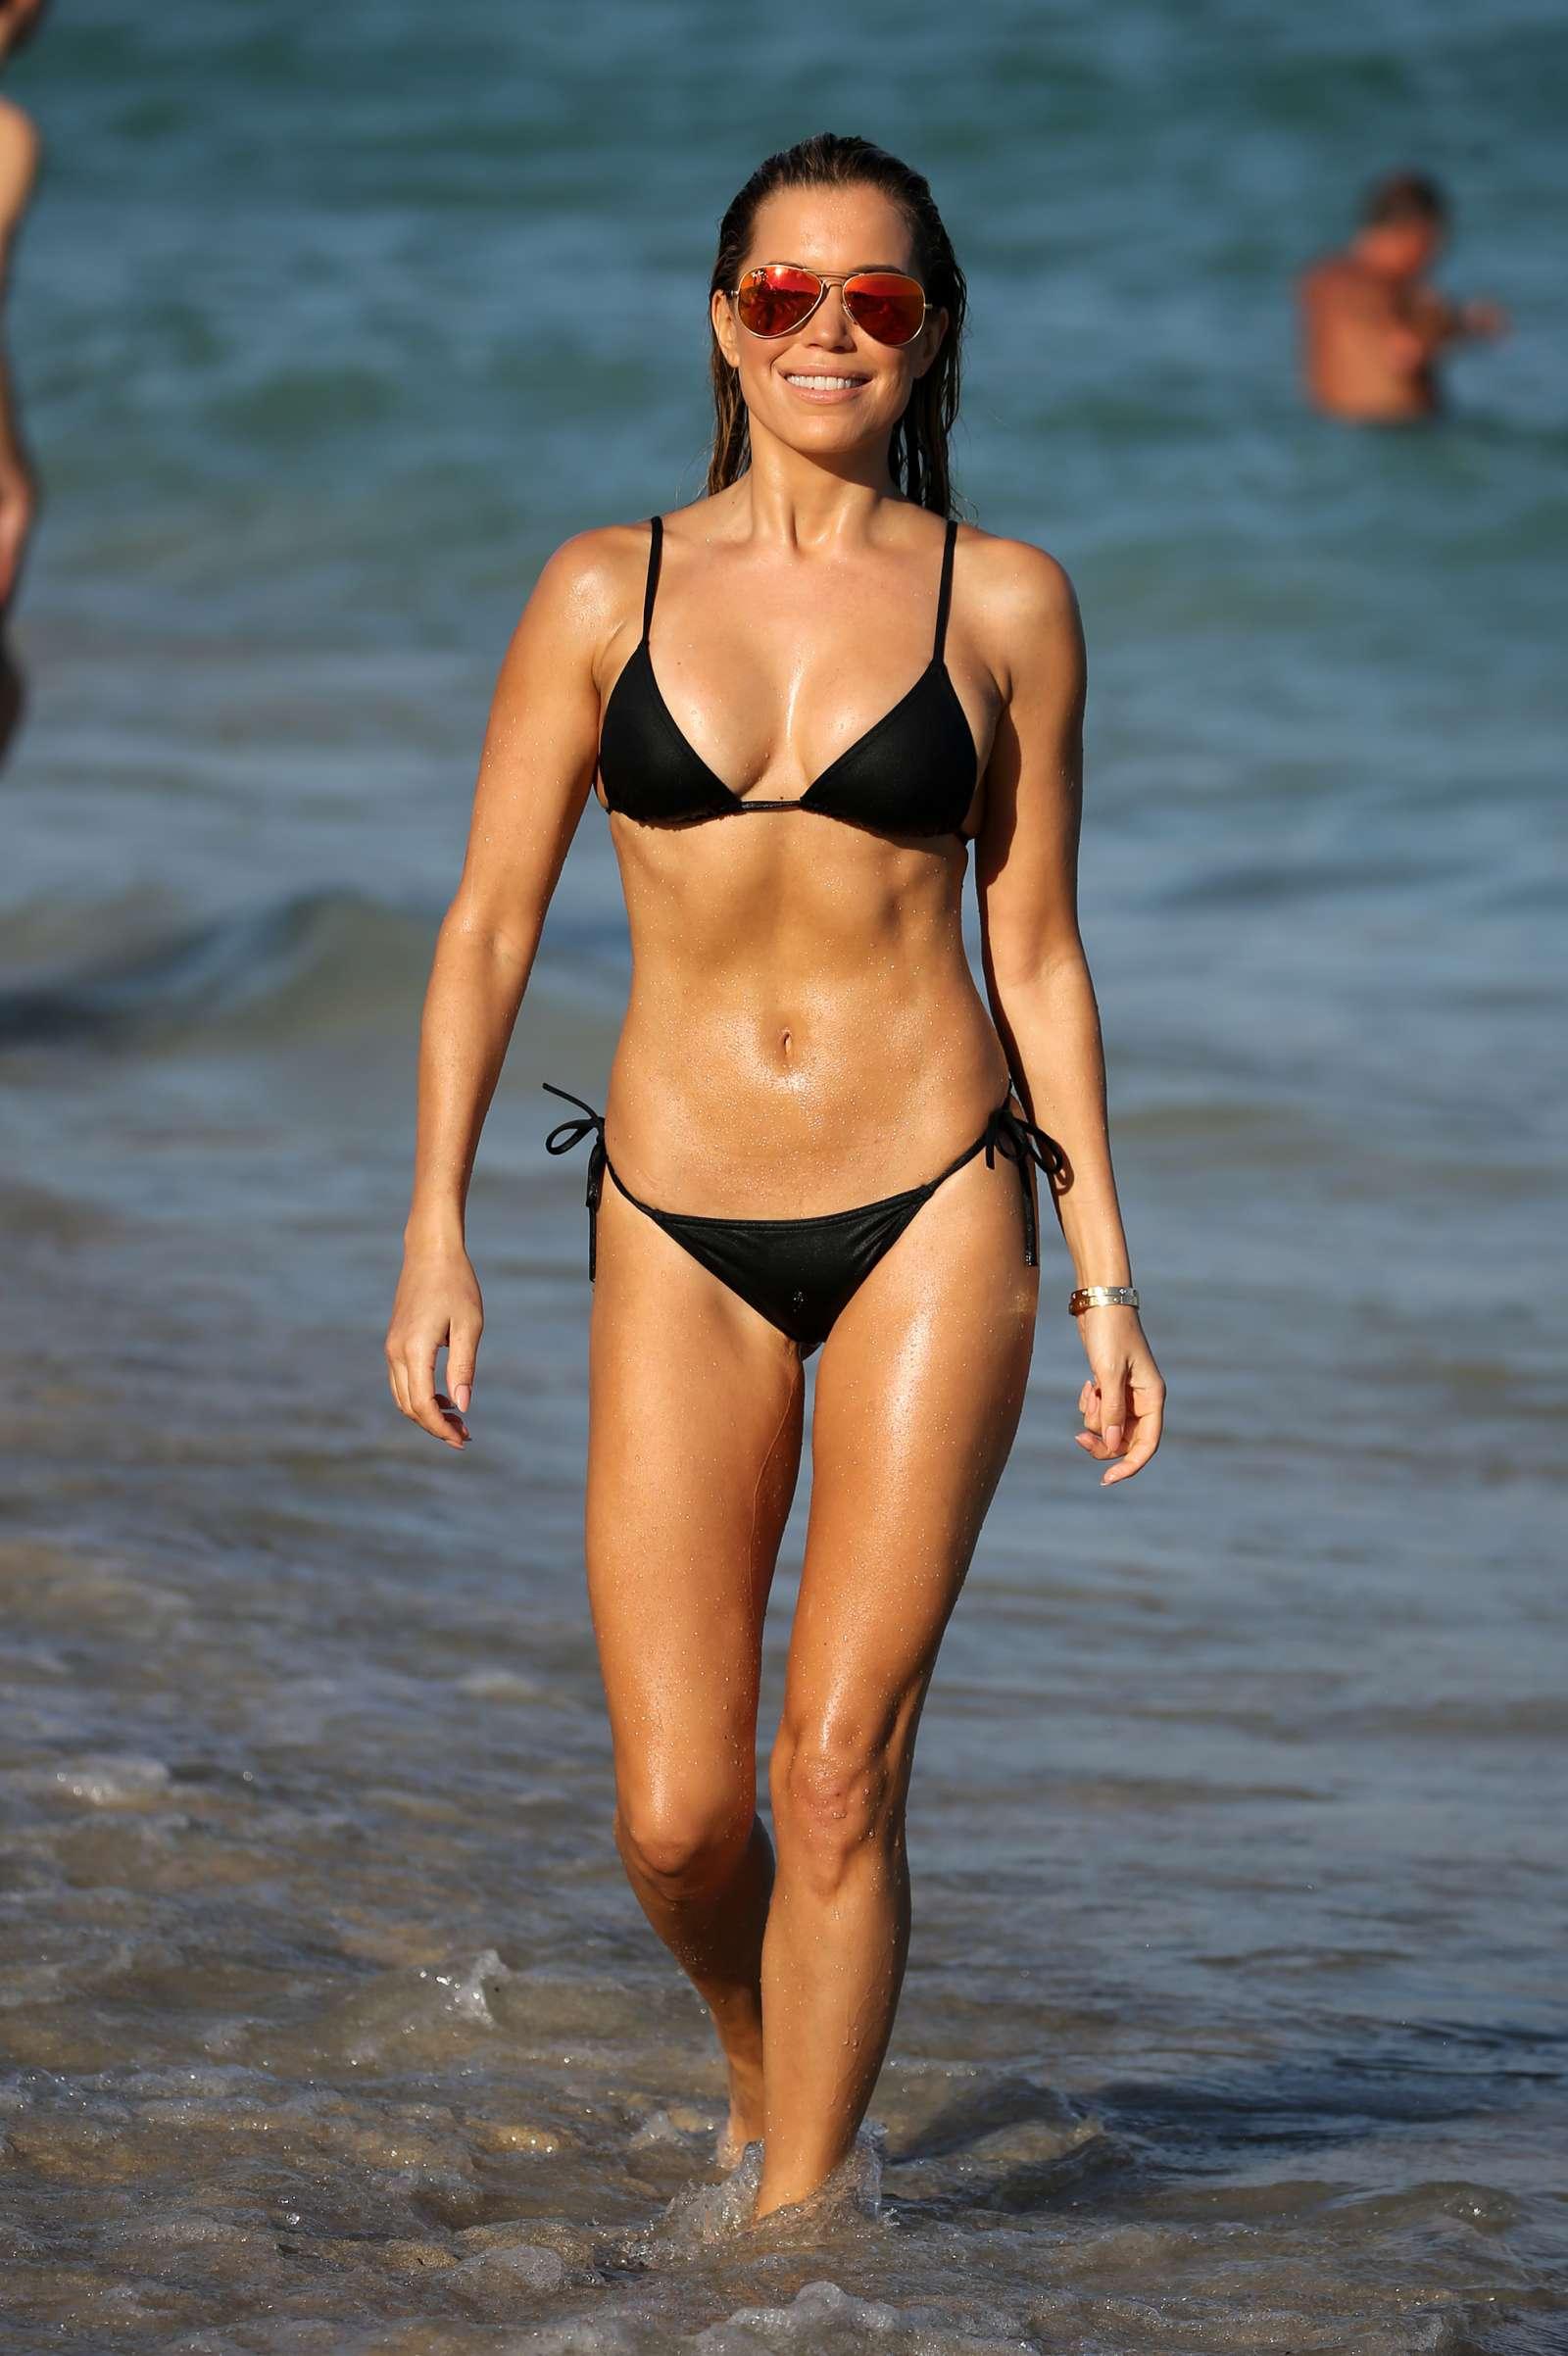 Sylvie Meis 2017 : Sylvie Meis in Black Bikini 2017 -28